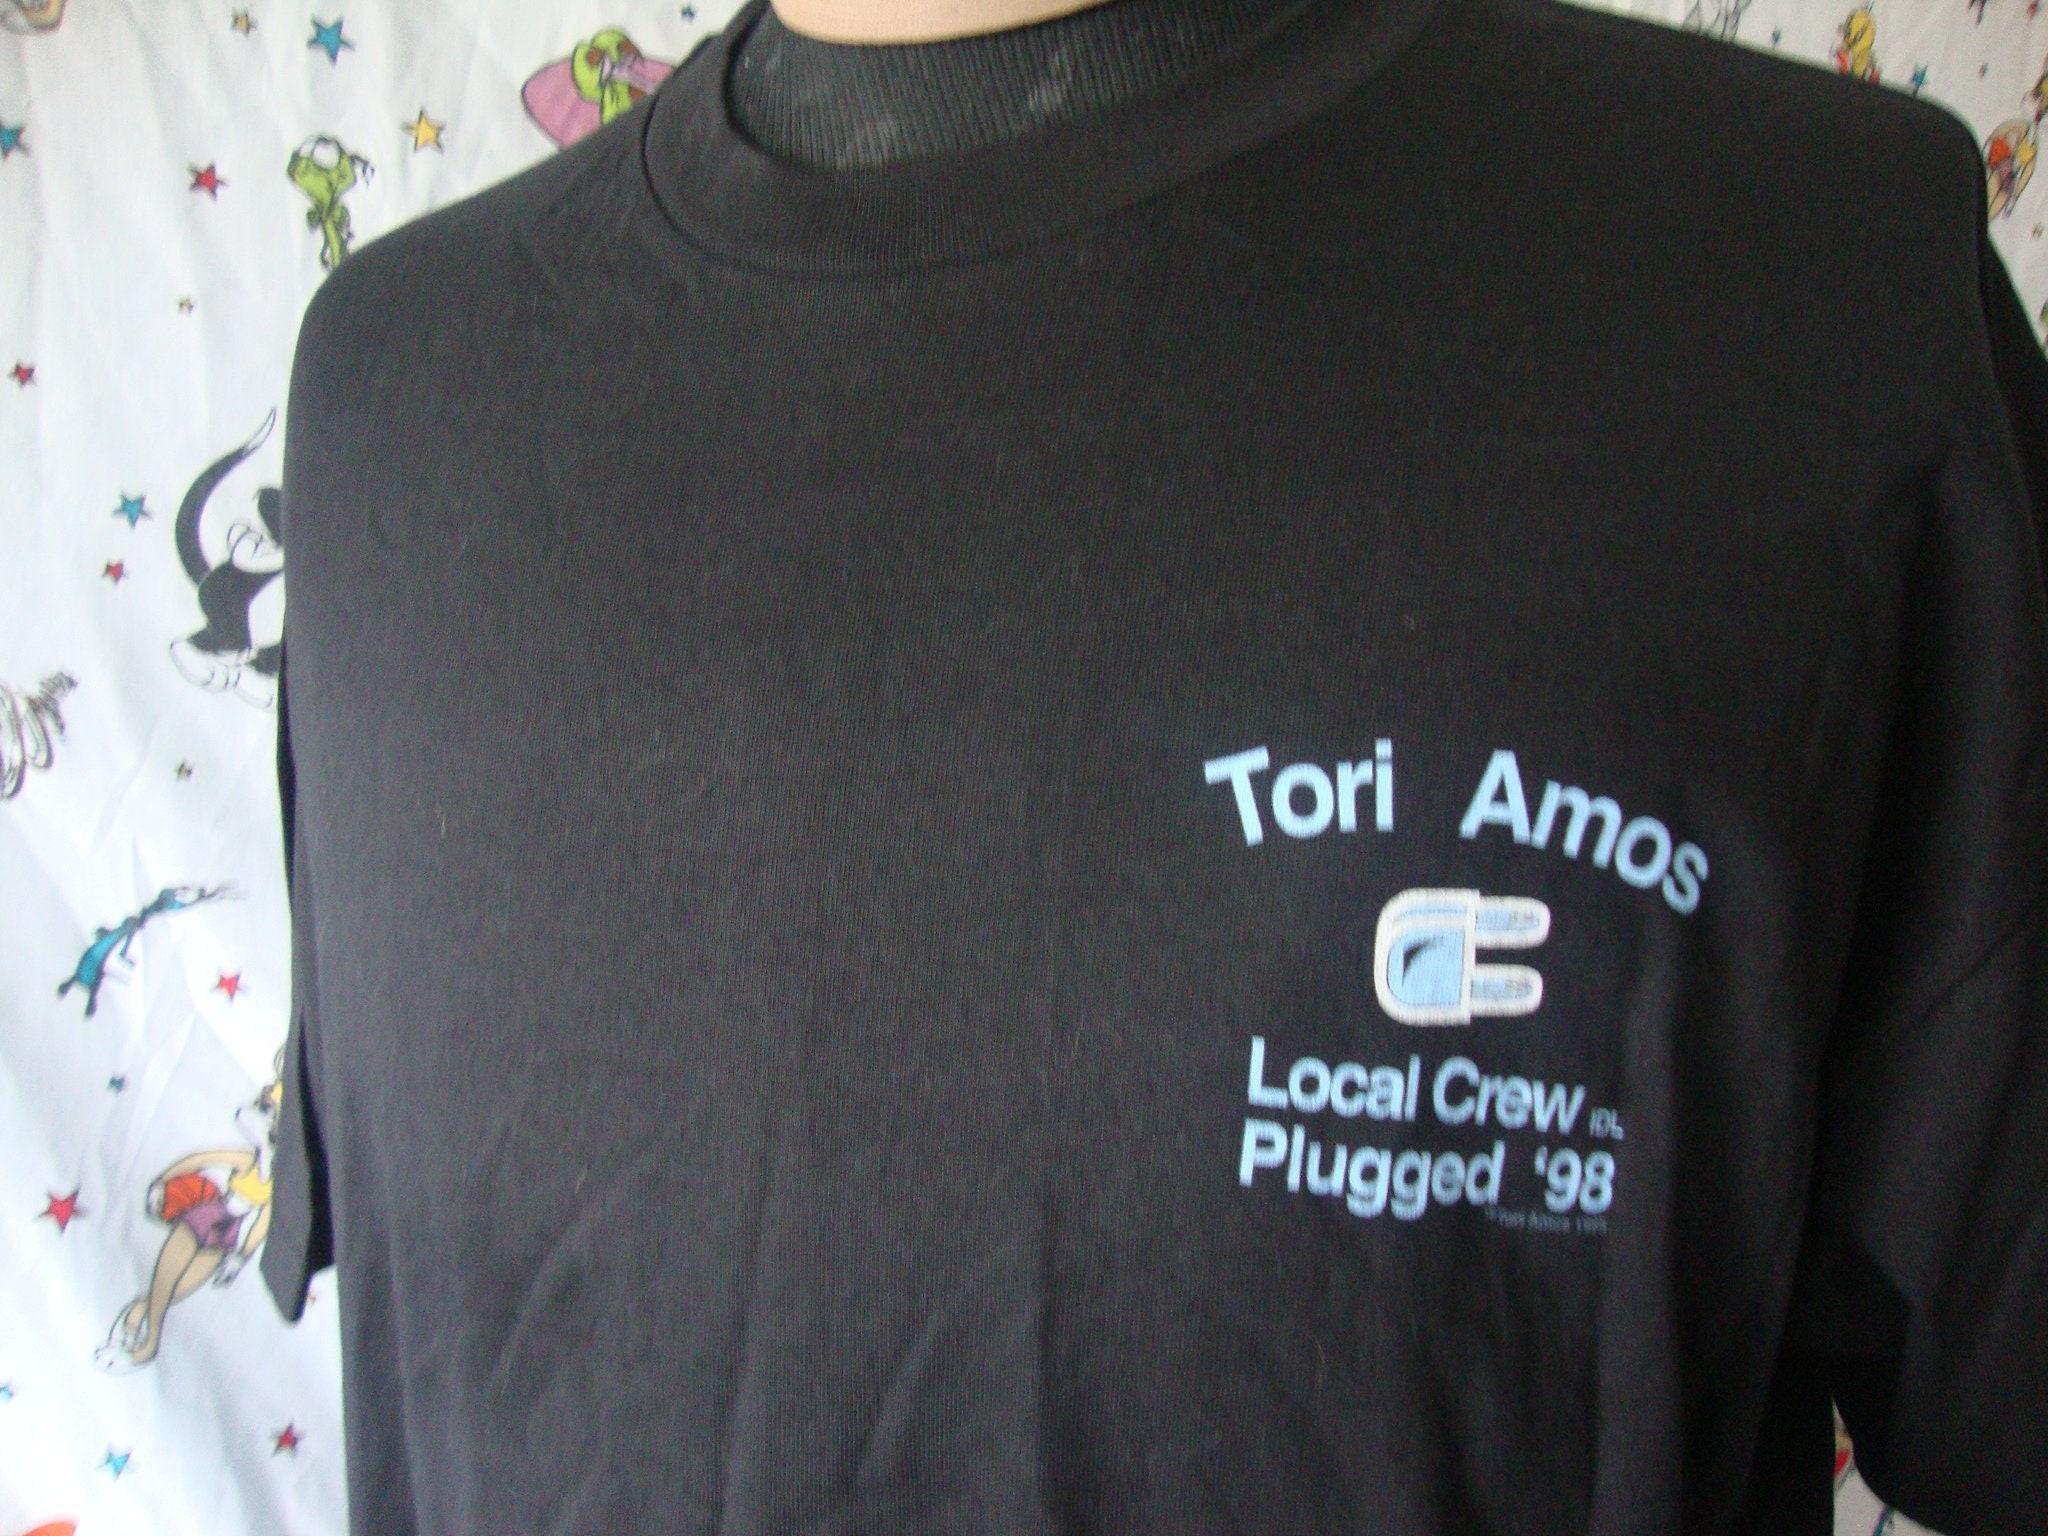 90 ' s Vintage Tori Amos Local Crew branché Shirt 1998 concert Tour T Shirt branché adulte taille XL 90b1bf